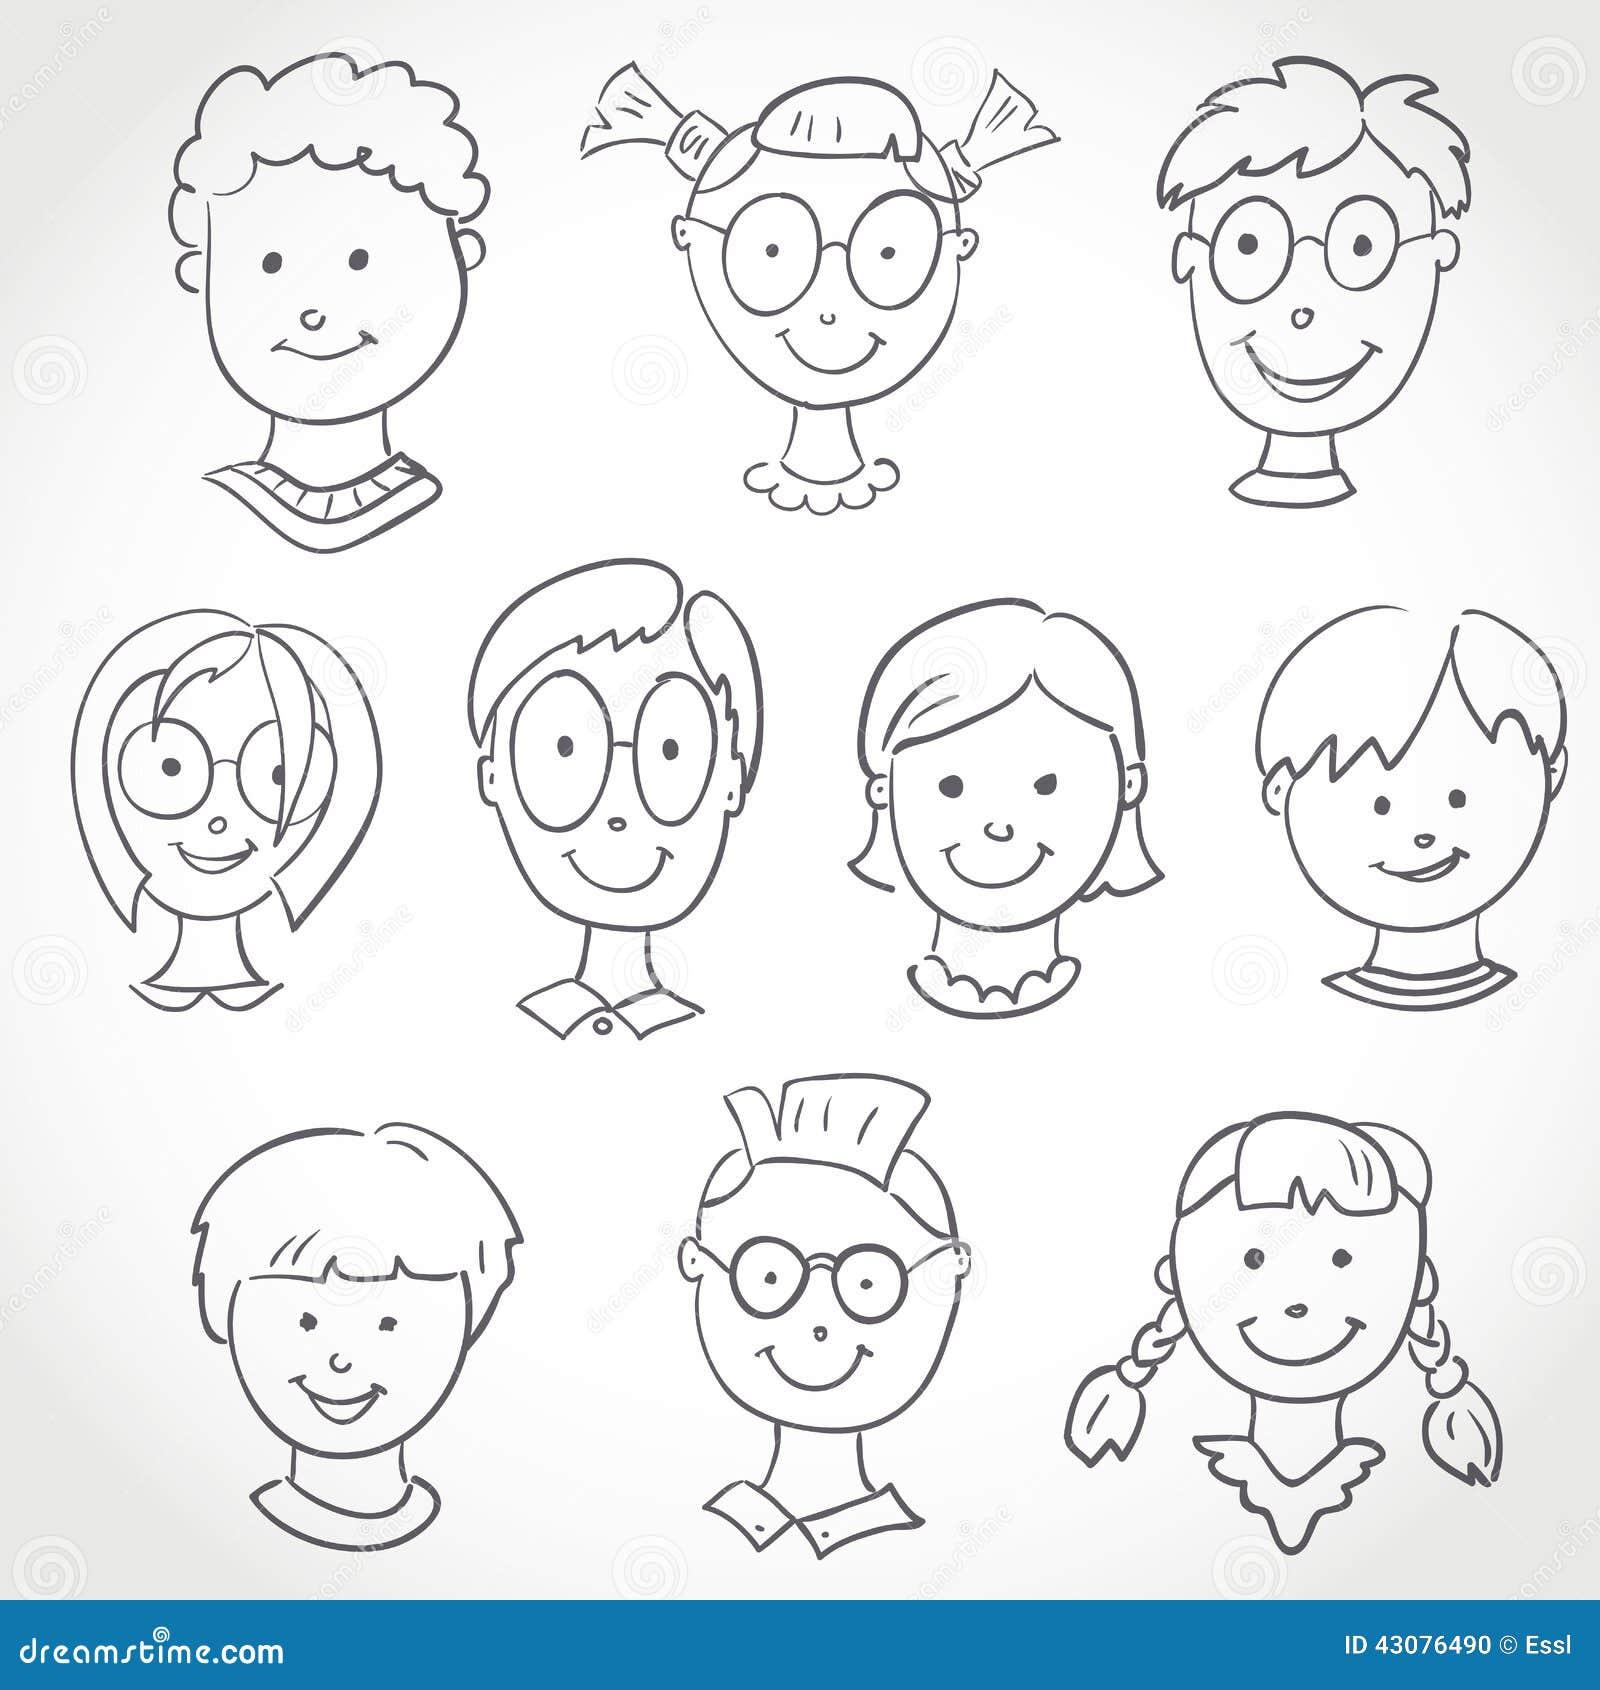 Kids Face Set Sketch Stock Vector - Image: 43076490